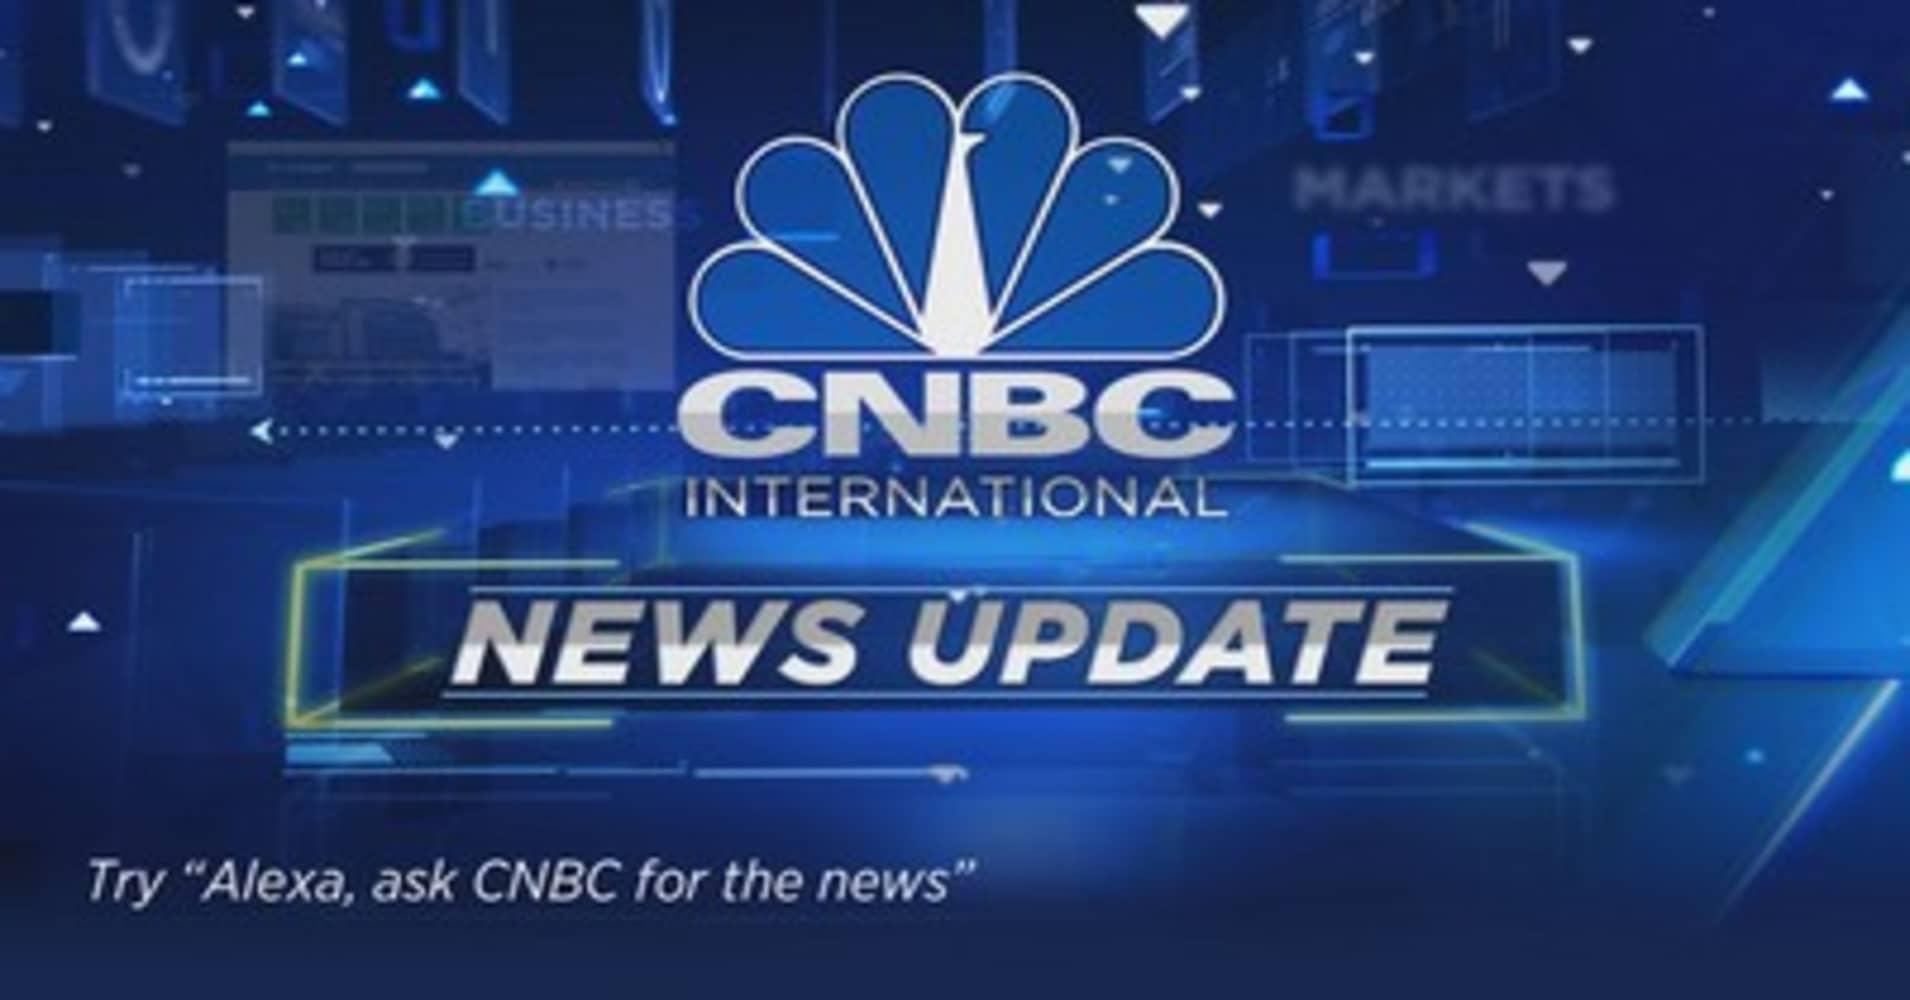 https://www cnbc com/video/2019/09/02/eu-banks-must-invest